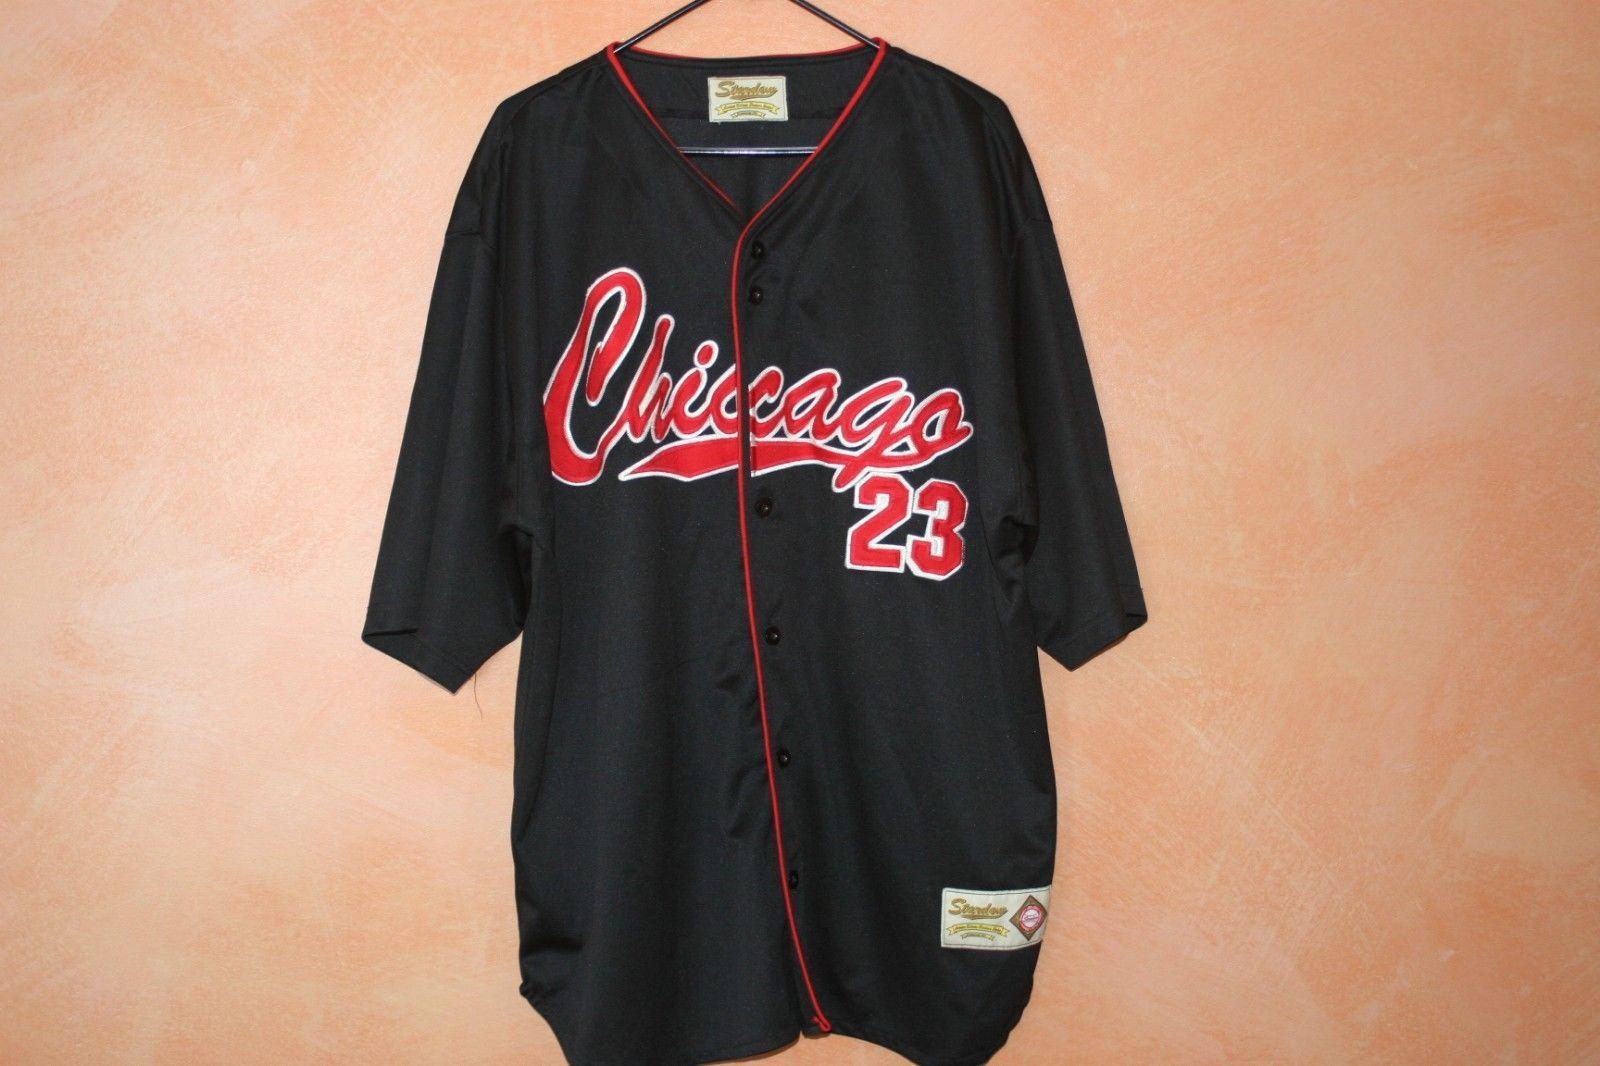 Chicago Cubs #23 All Star Baseball Jersey Stardom Limited Edition Stadium Series